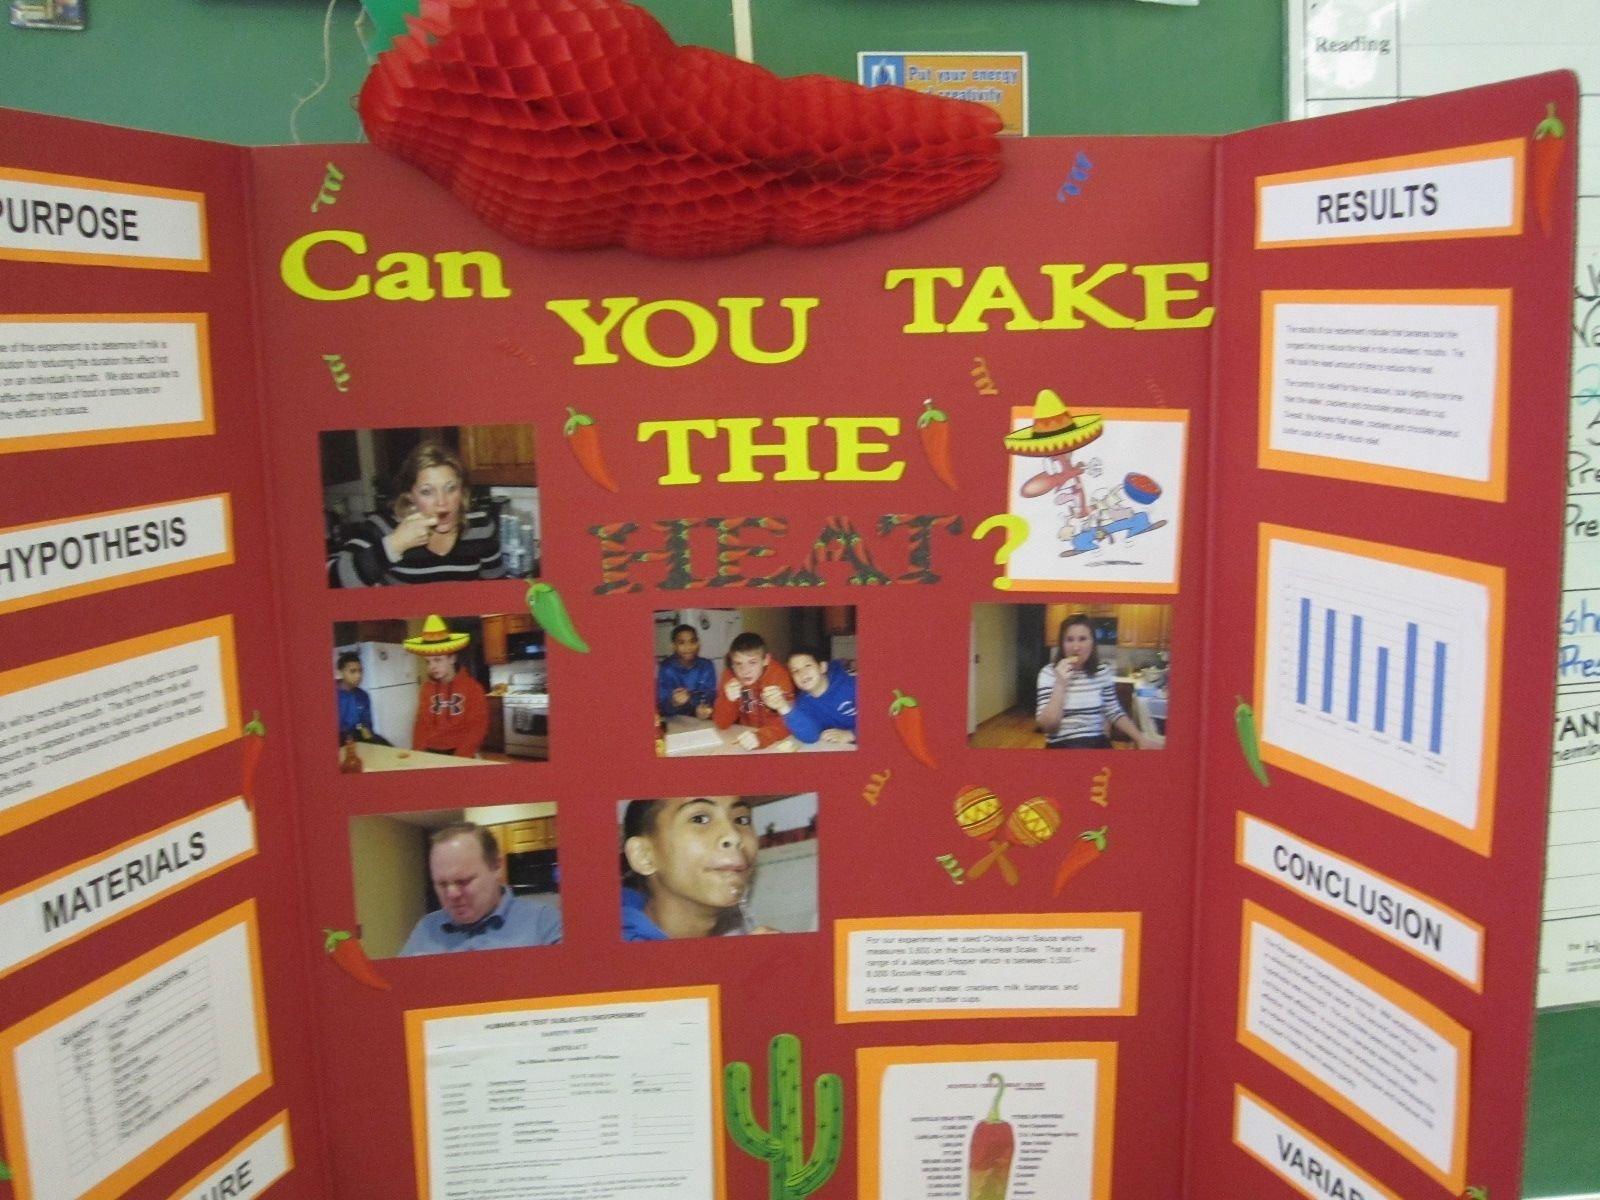 10 Cute Science Fair Project Ideas 8Th Grade second grade science fair topics learnkids science im kinda 17